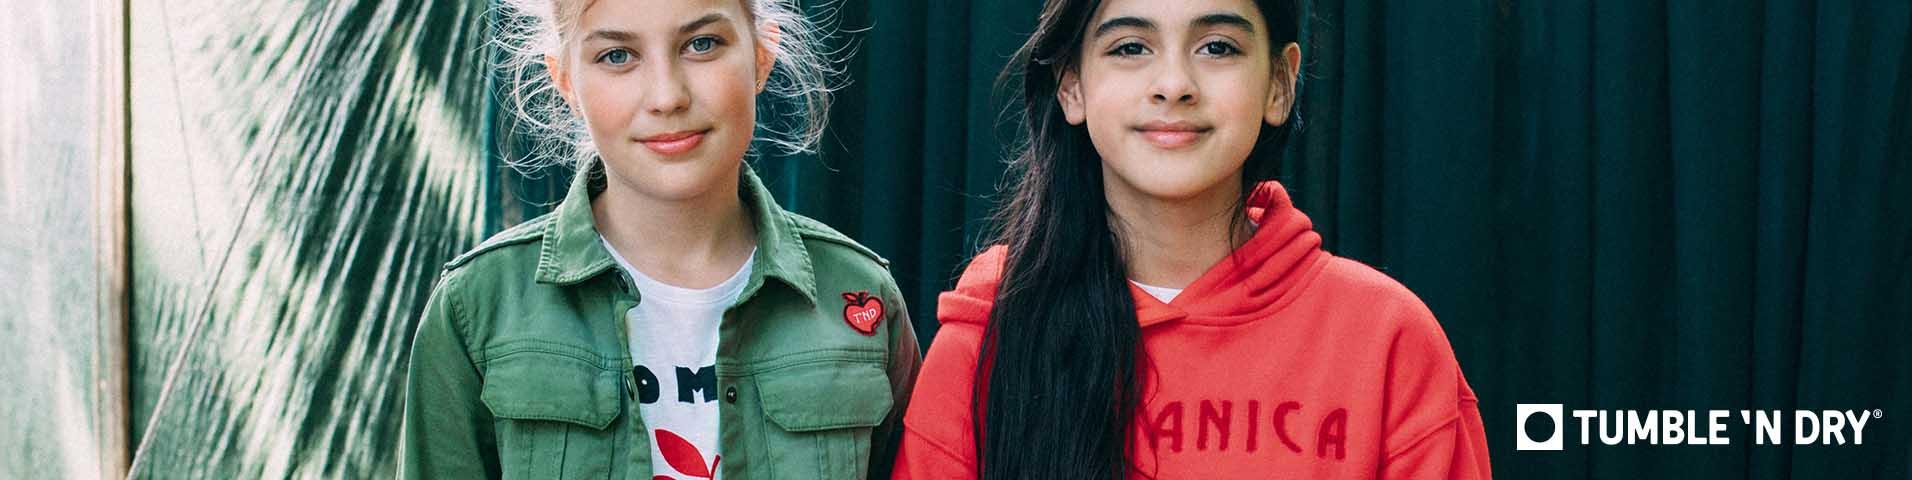 Kinderkleding Zalando.Tumble N Dry Kinderkleding Online Kopen Gratis Verzending Zalando